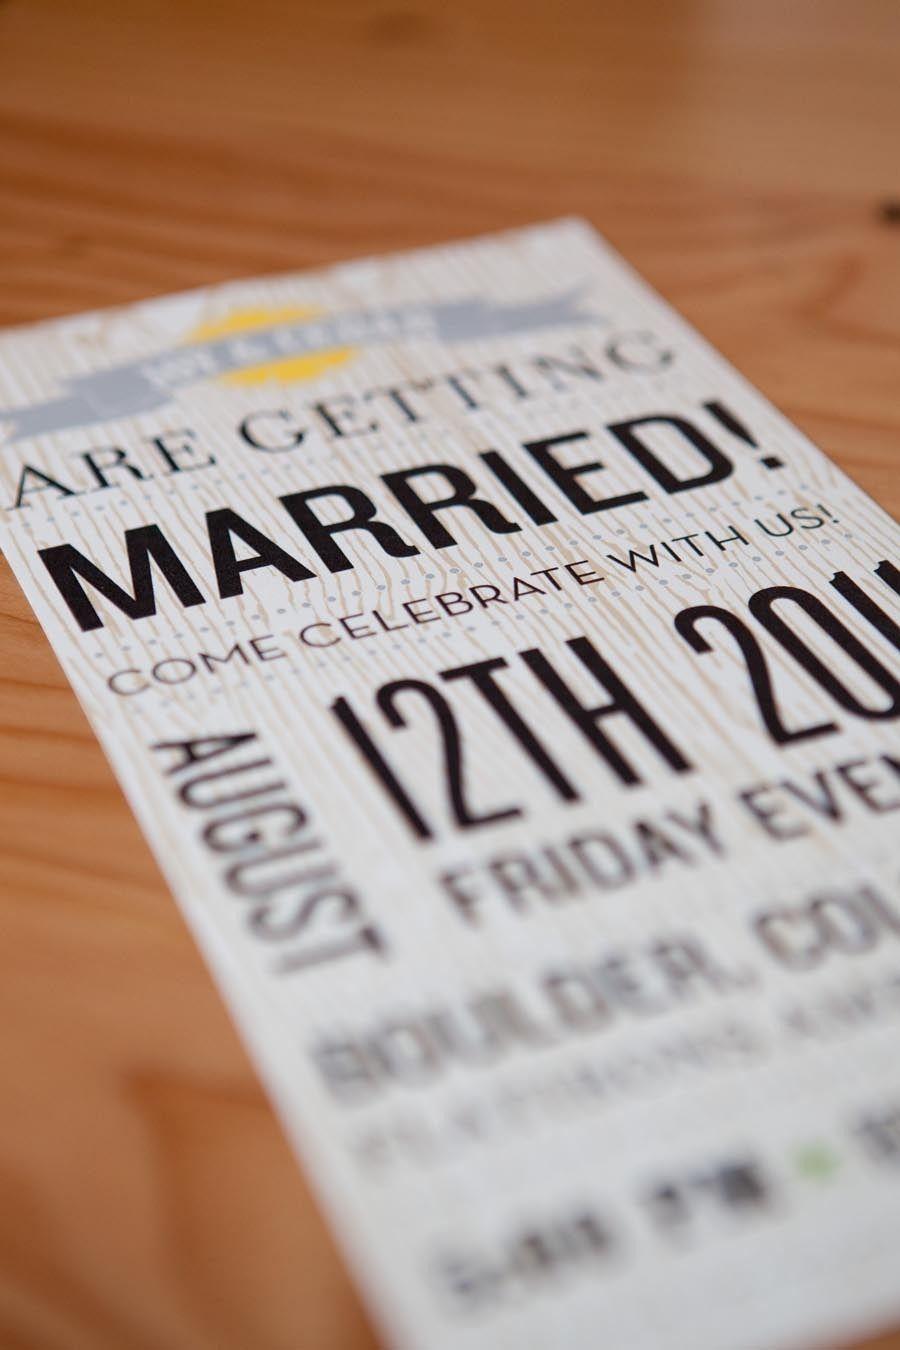 #save-the-date  Photography: Megan Newton Photography - megannewtonphotography.com Event Design and Styling: Calluna Events - CallunaEvents.com Floral Design: Boulder Blooms - boulderblooms.com  Read More: http://www.stylemepretty.com/southwest-weddings/2013/03/20/organic-dinner-photo-shoot-from-calluna-events/